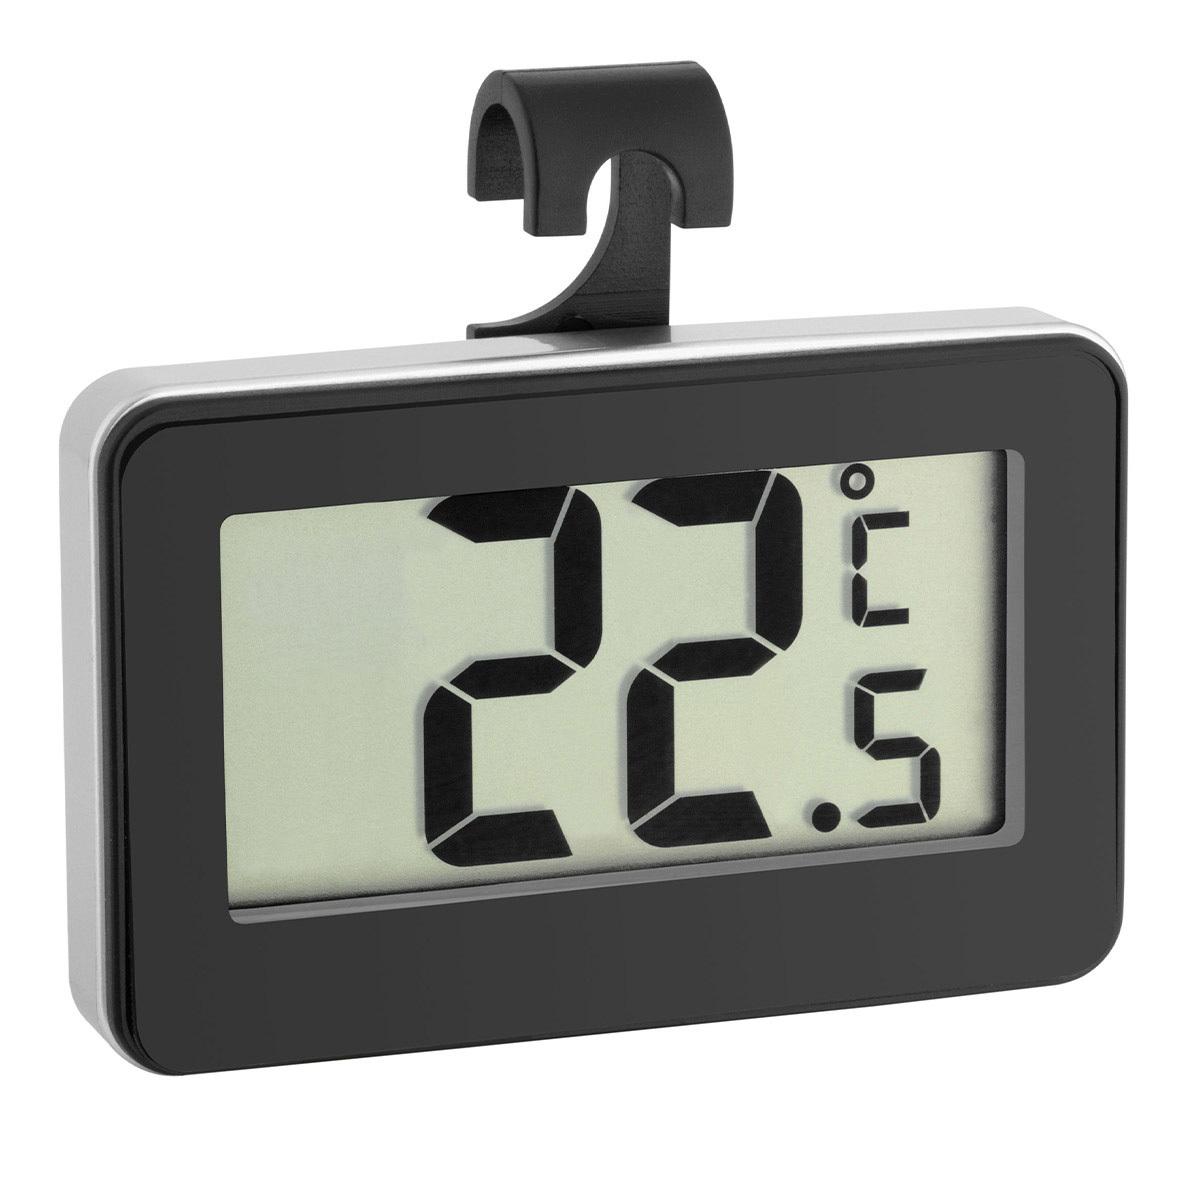 30-2028-01-digitales-thermometer-ansicht1-1200x1200px.jpg